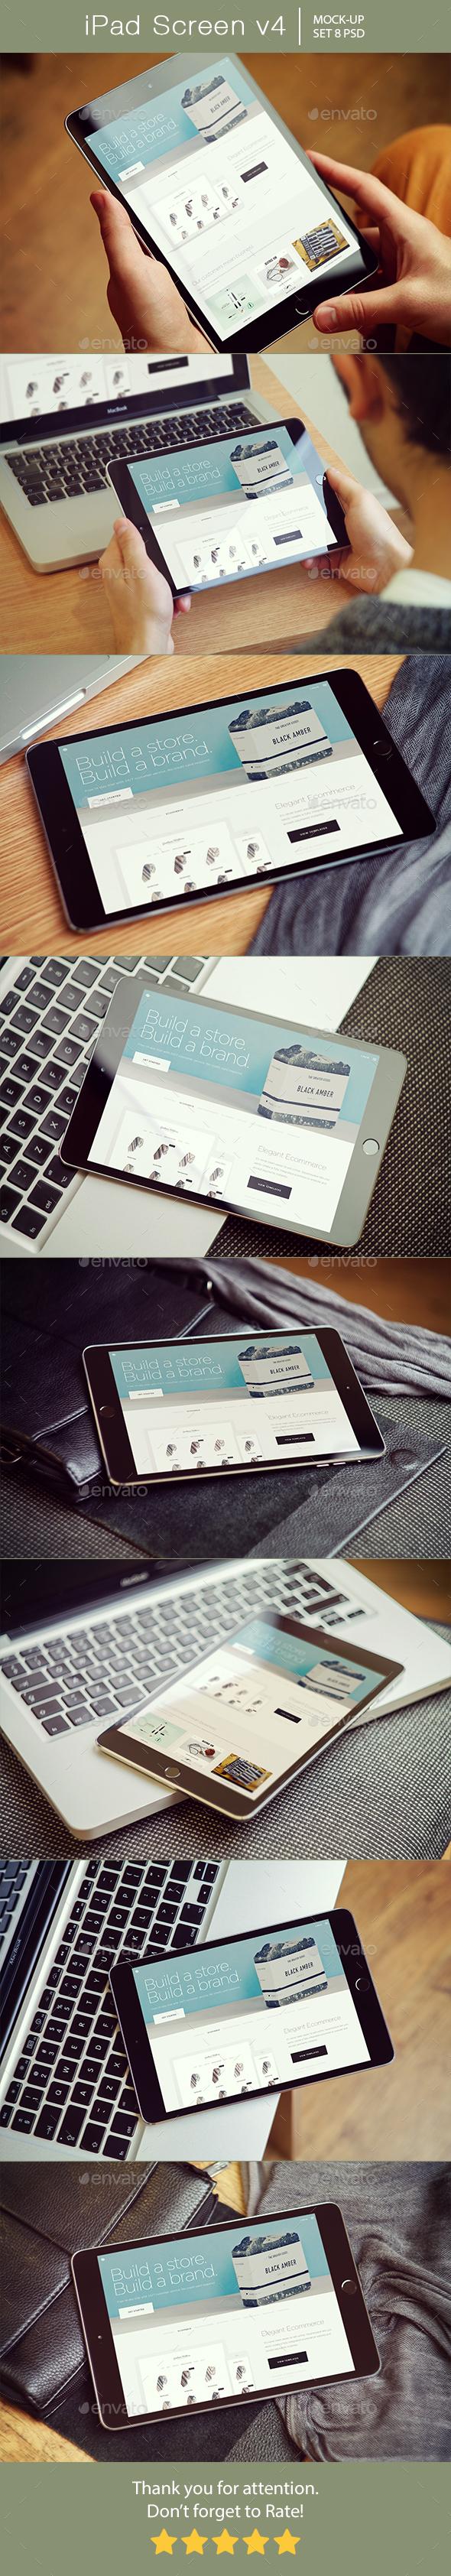 iPad Screen Mockup v4 - Mobile Displays